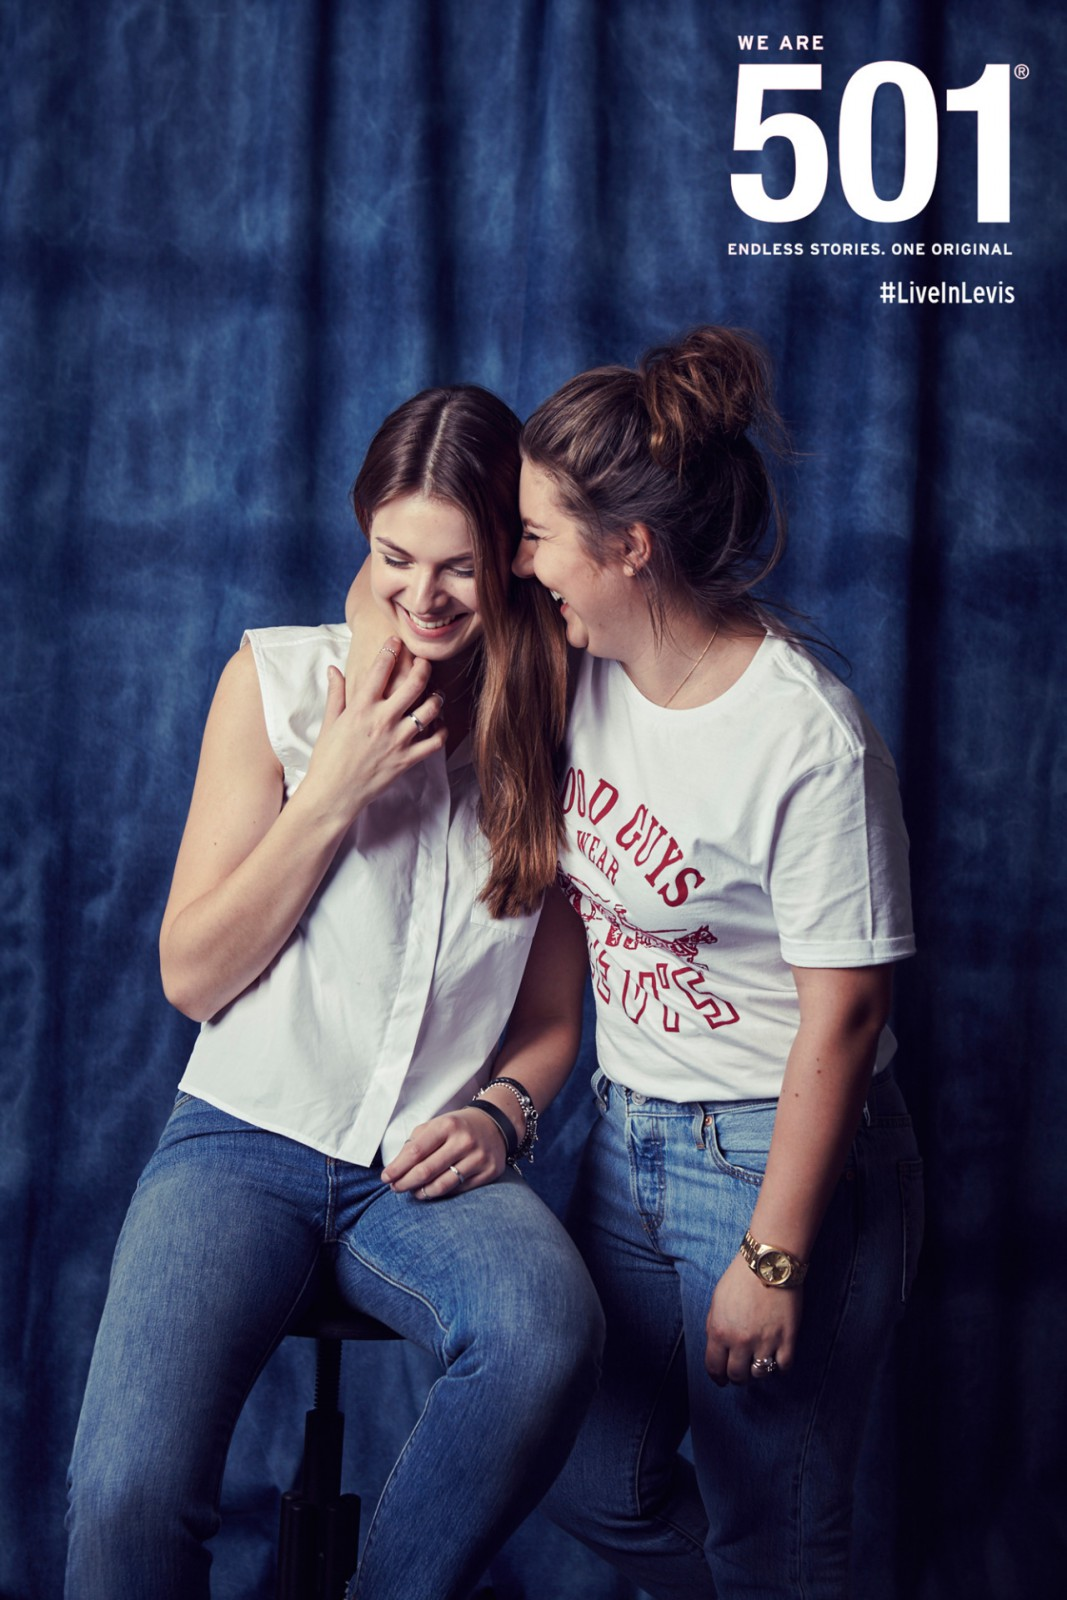 Fashionblogger Friendship